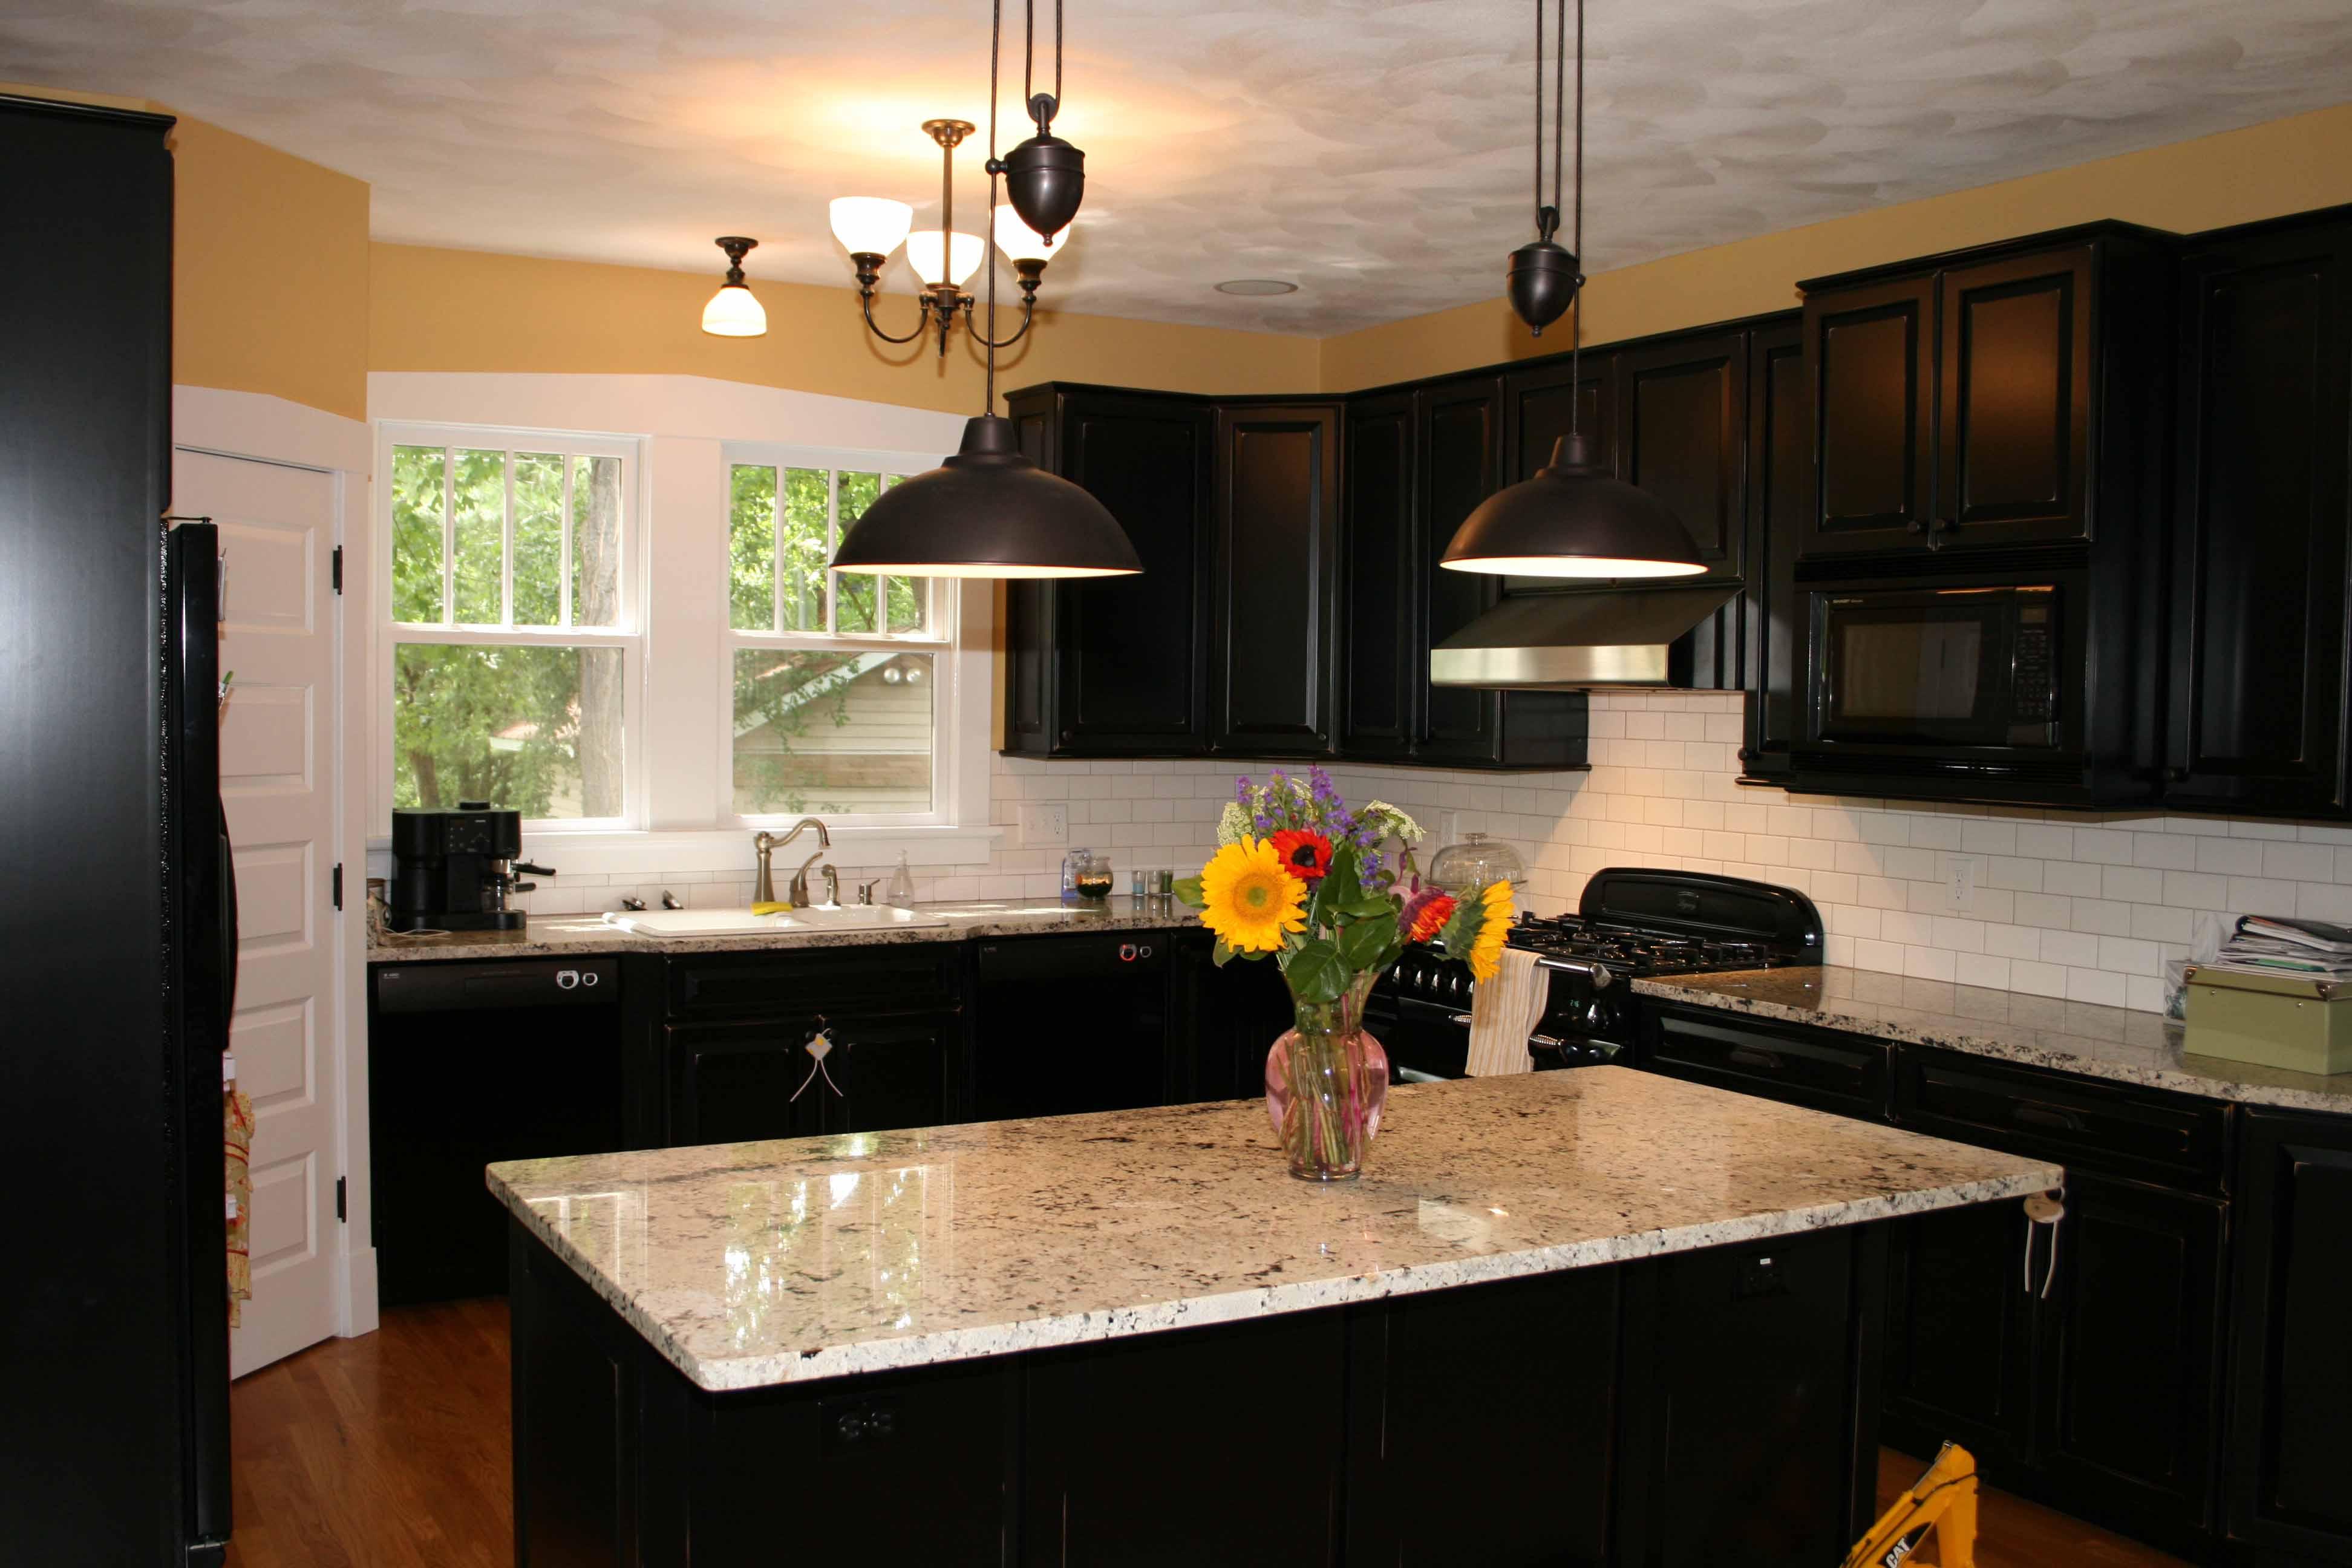 Tropical kitchen rugs – Kitchen ideas